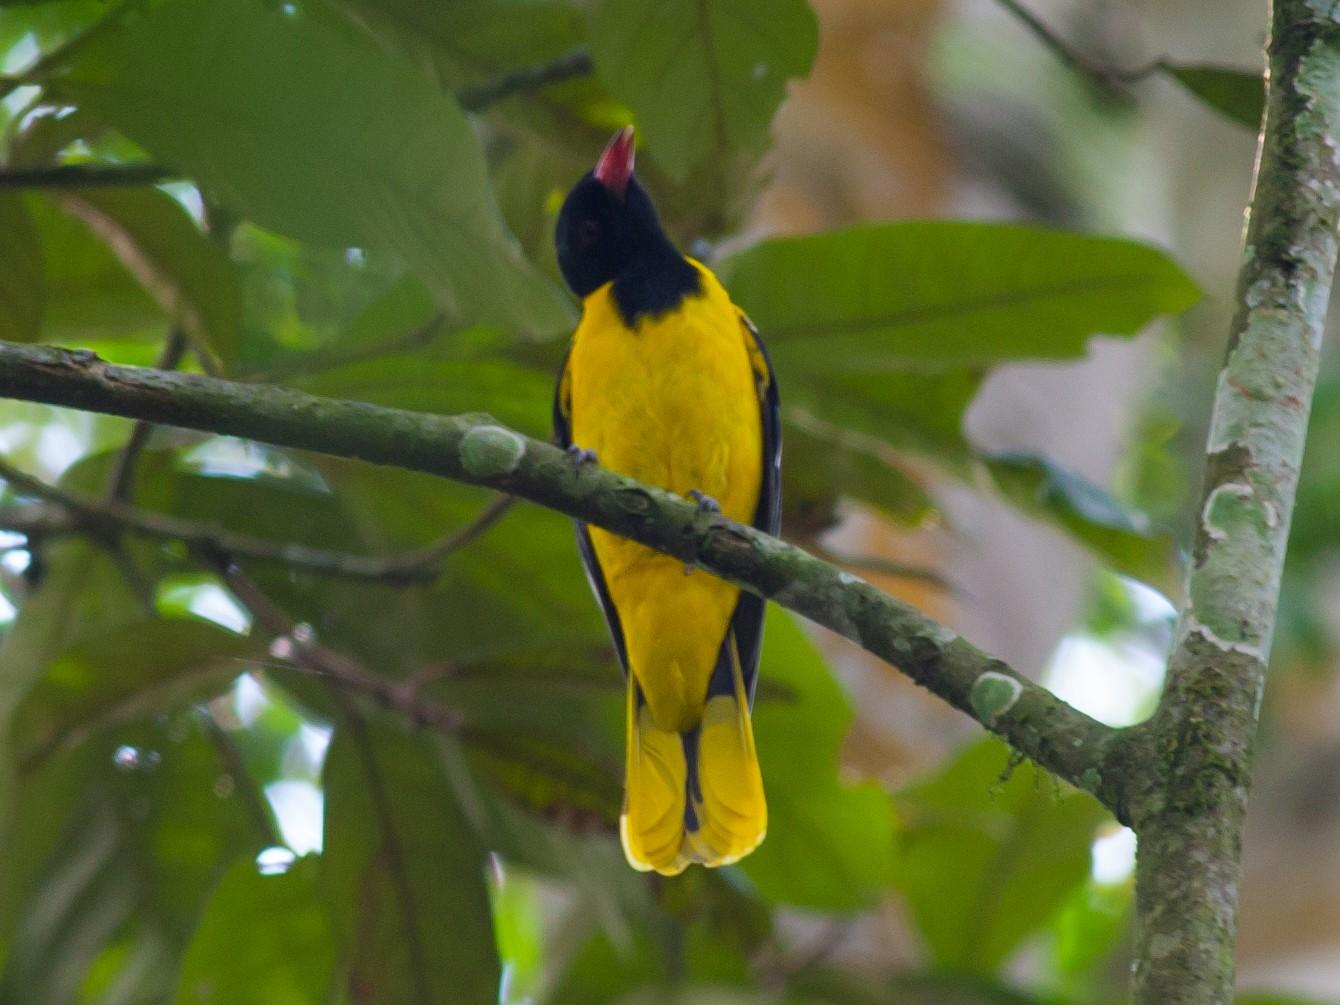 Black-tailed Oriole - Vivek Menon